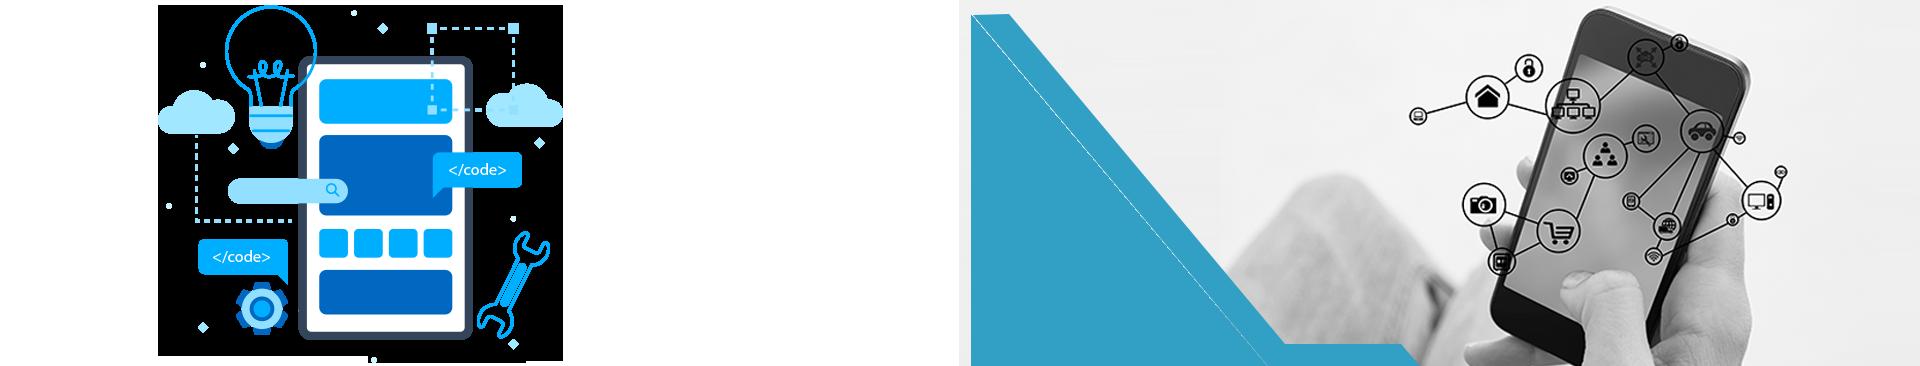 mobile app development company united states